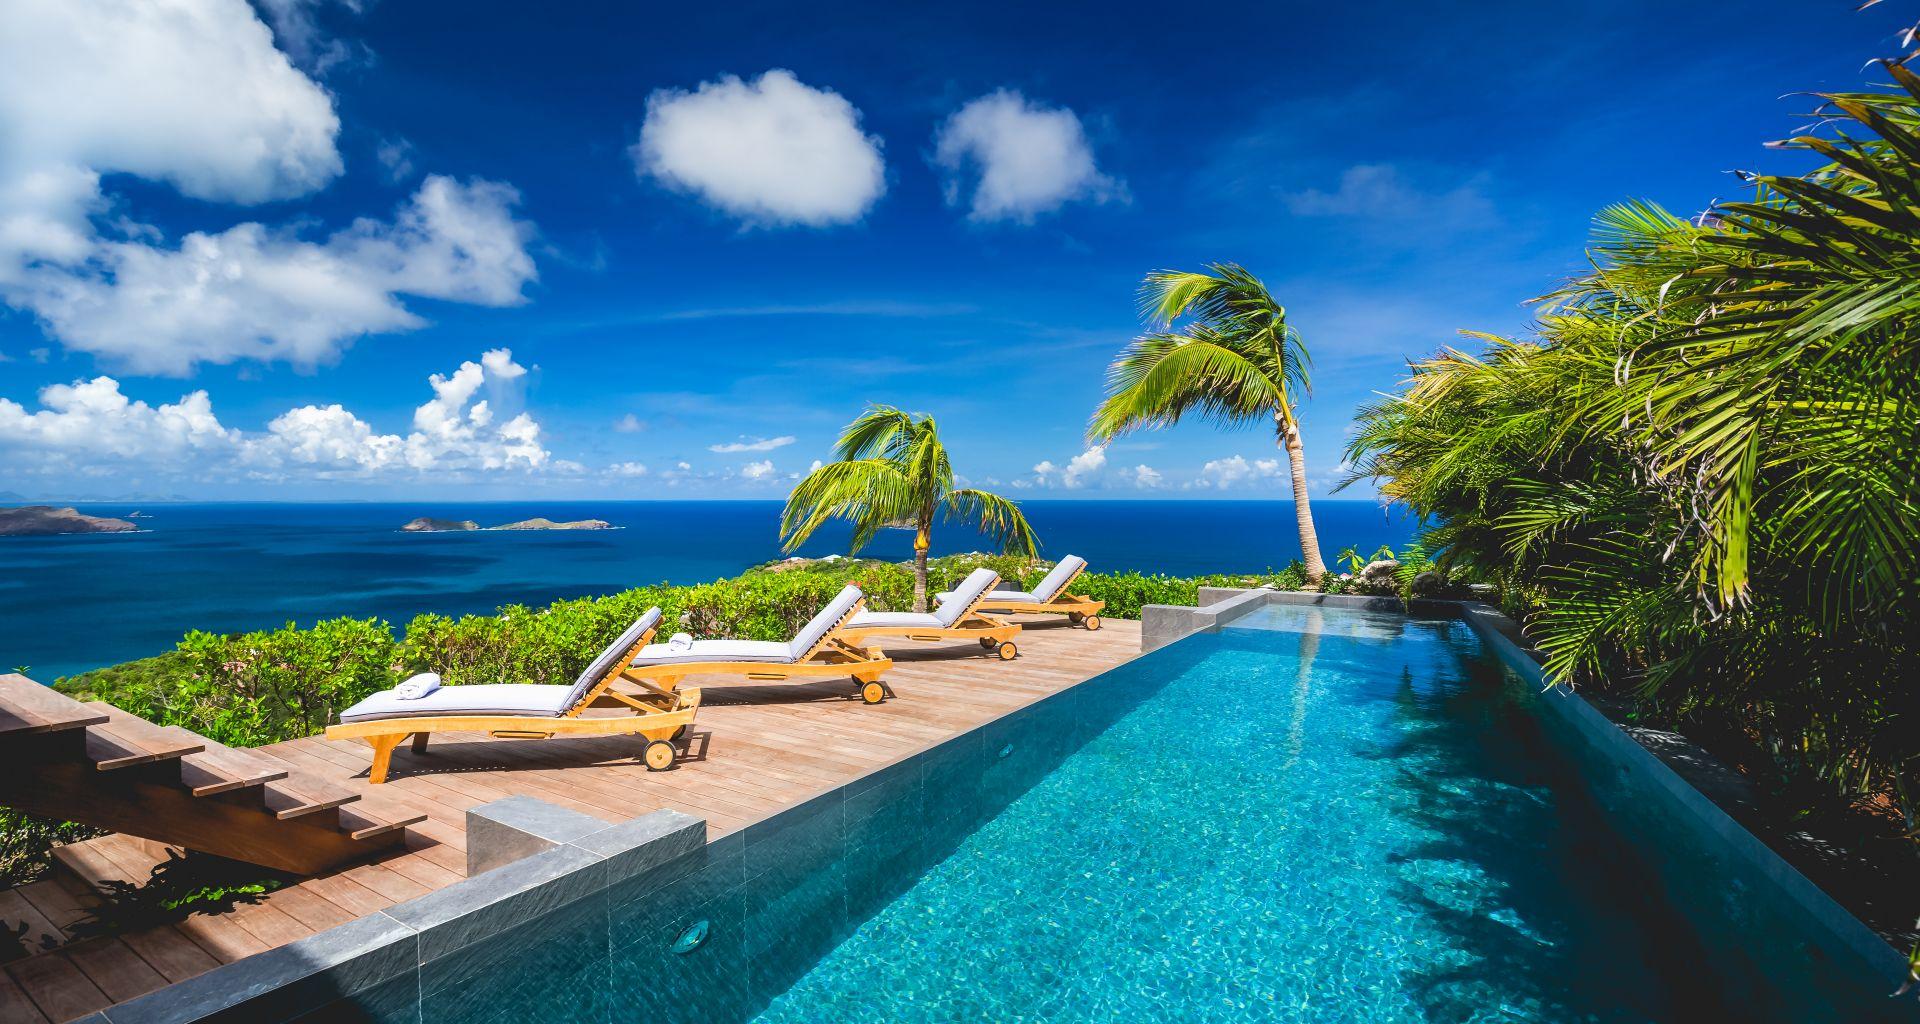 Villa Clementine, St-Barth, Caribbean